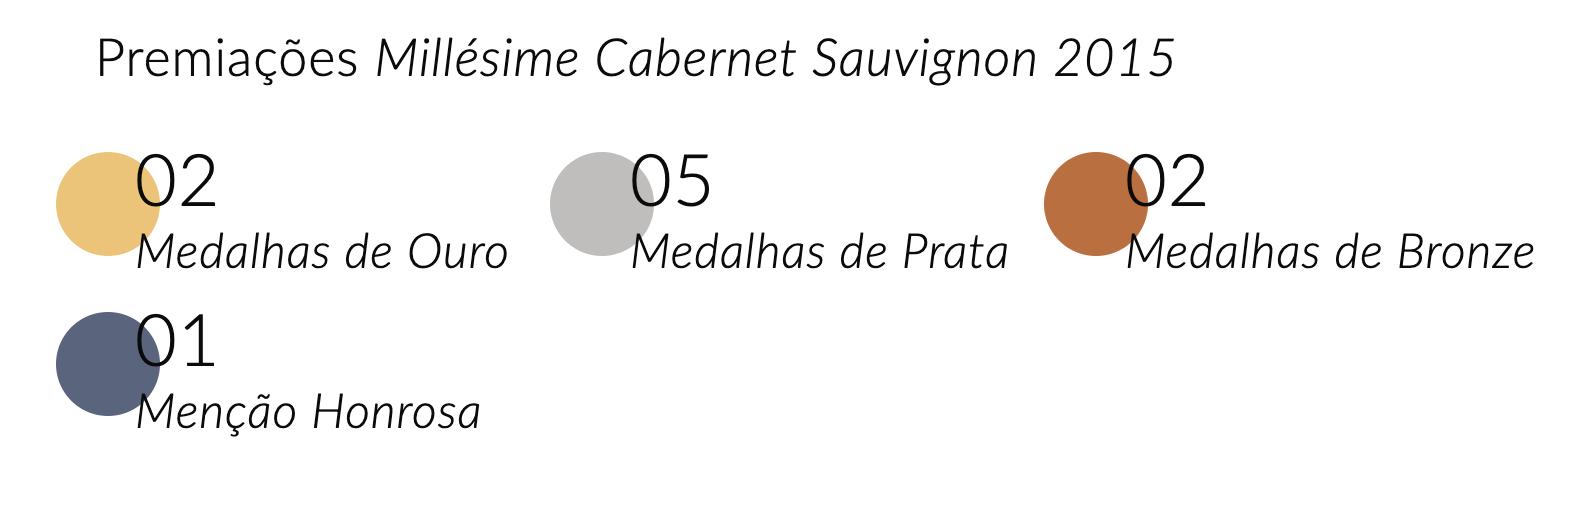 AURORA MILLESIME CABERNET SAUVIGNON 2015 CX/ 6  750ML